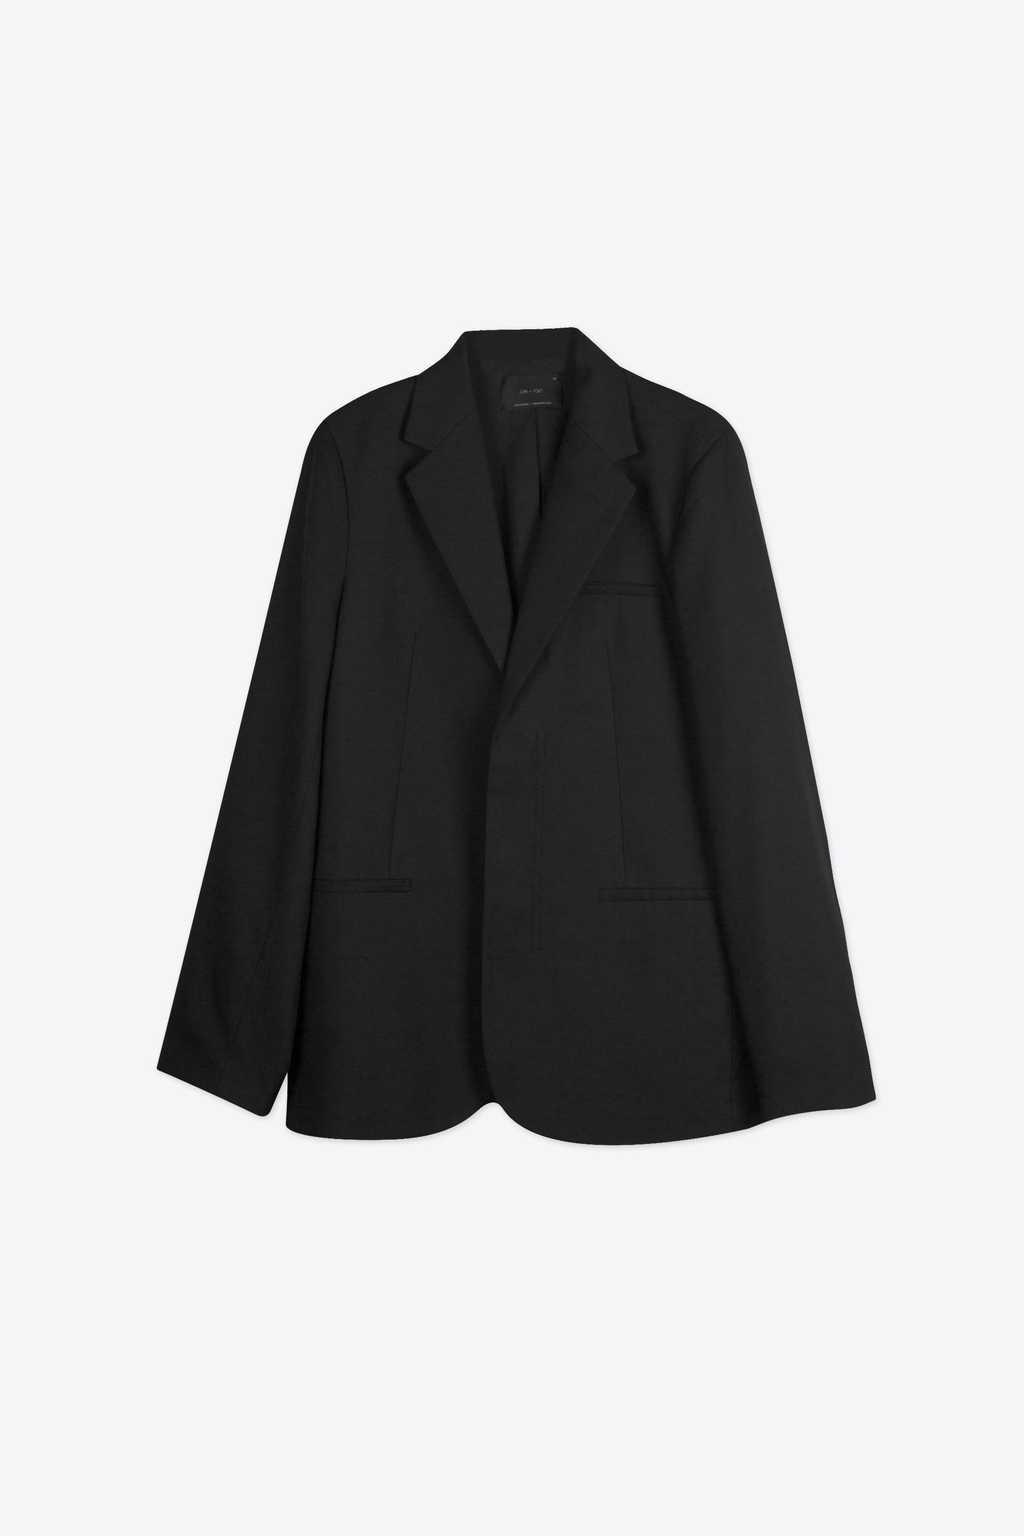 Jacket 1421 Black 11